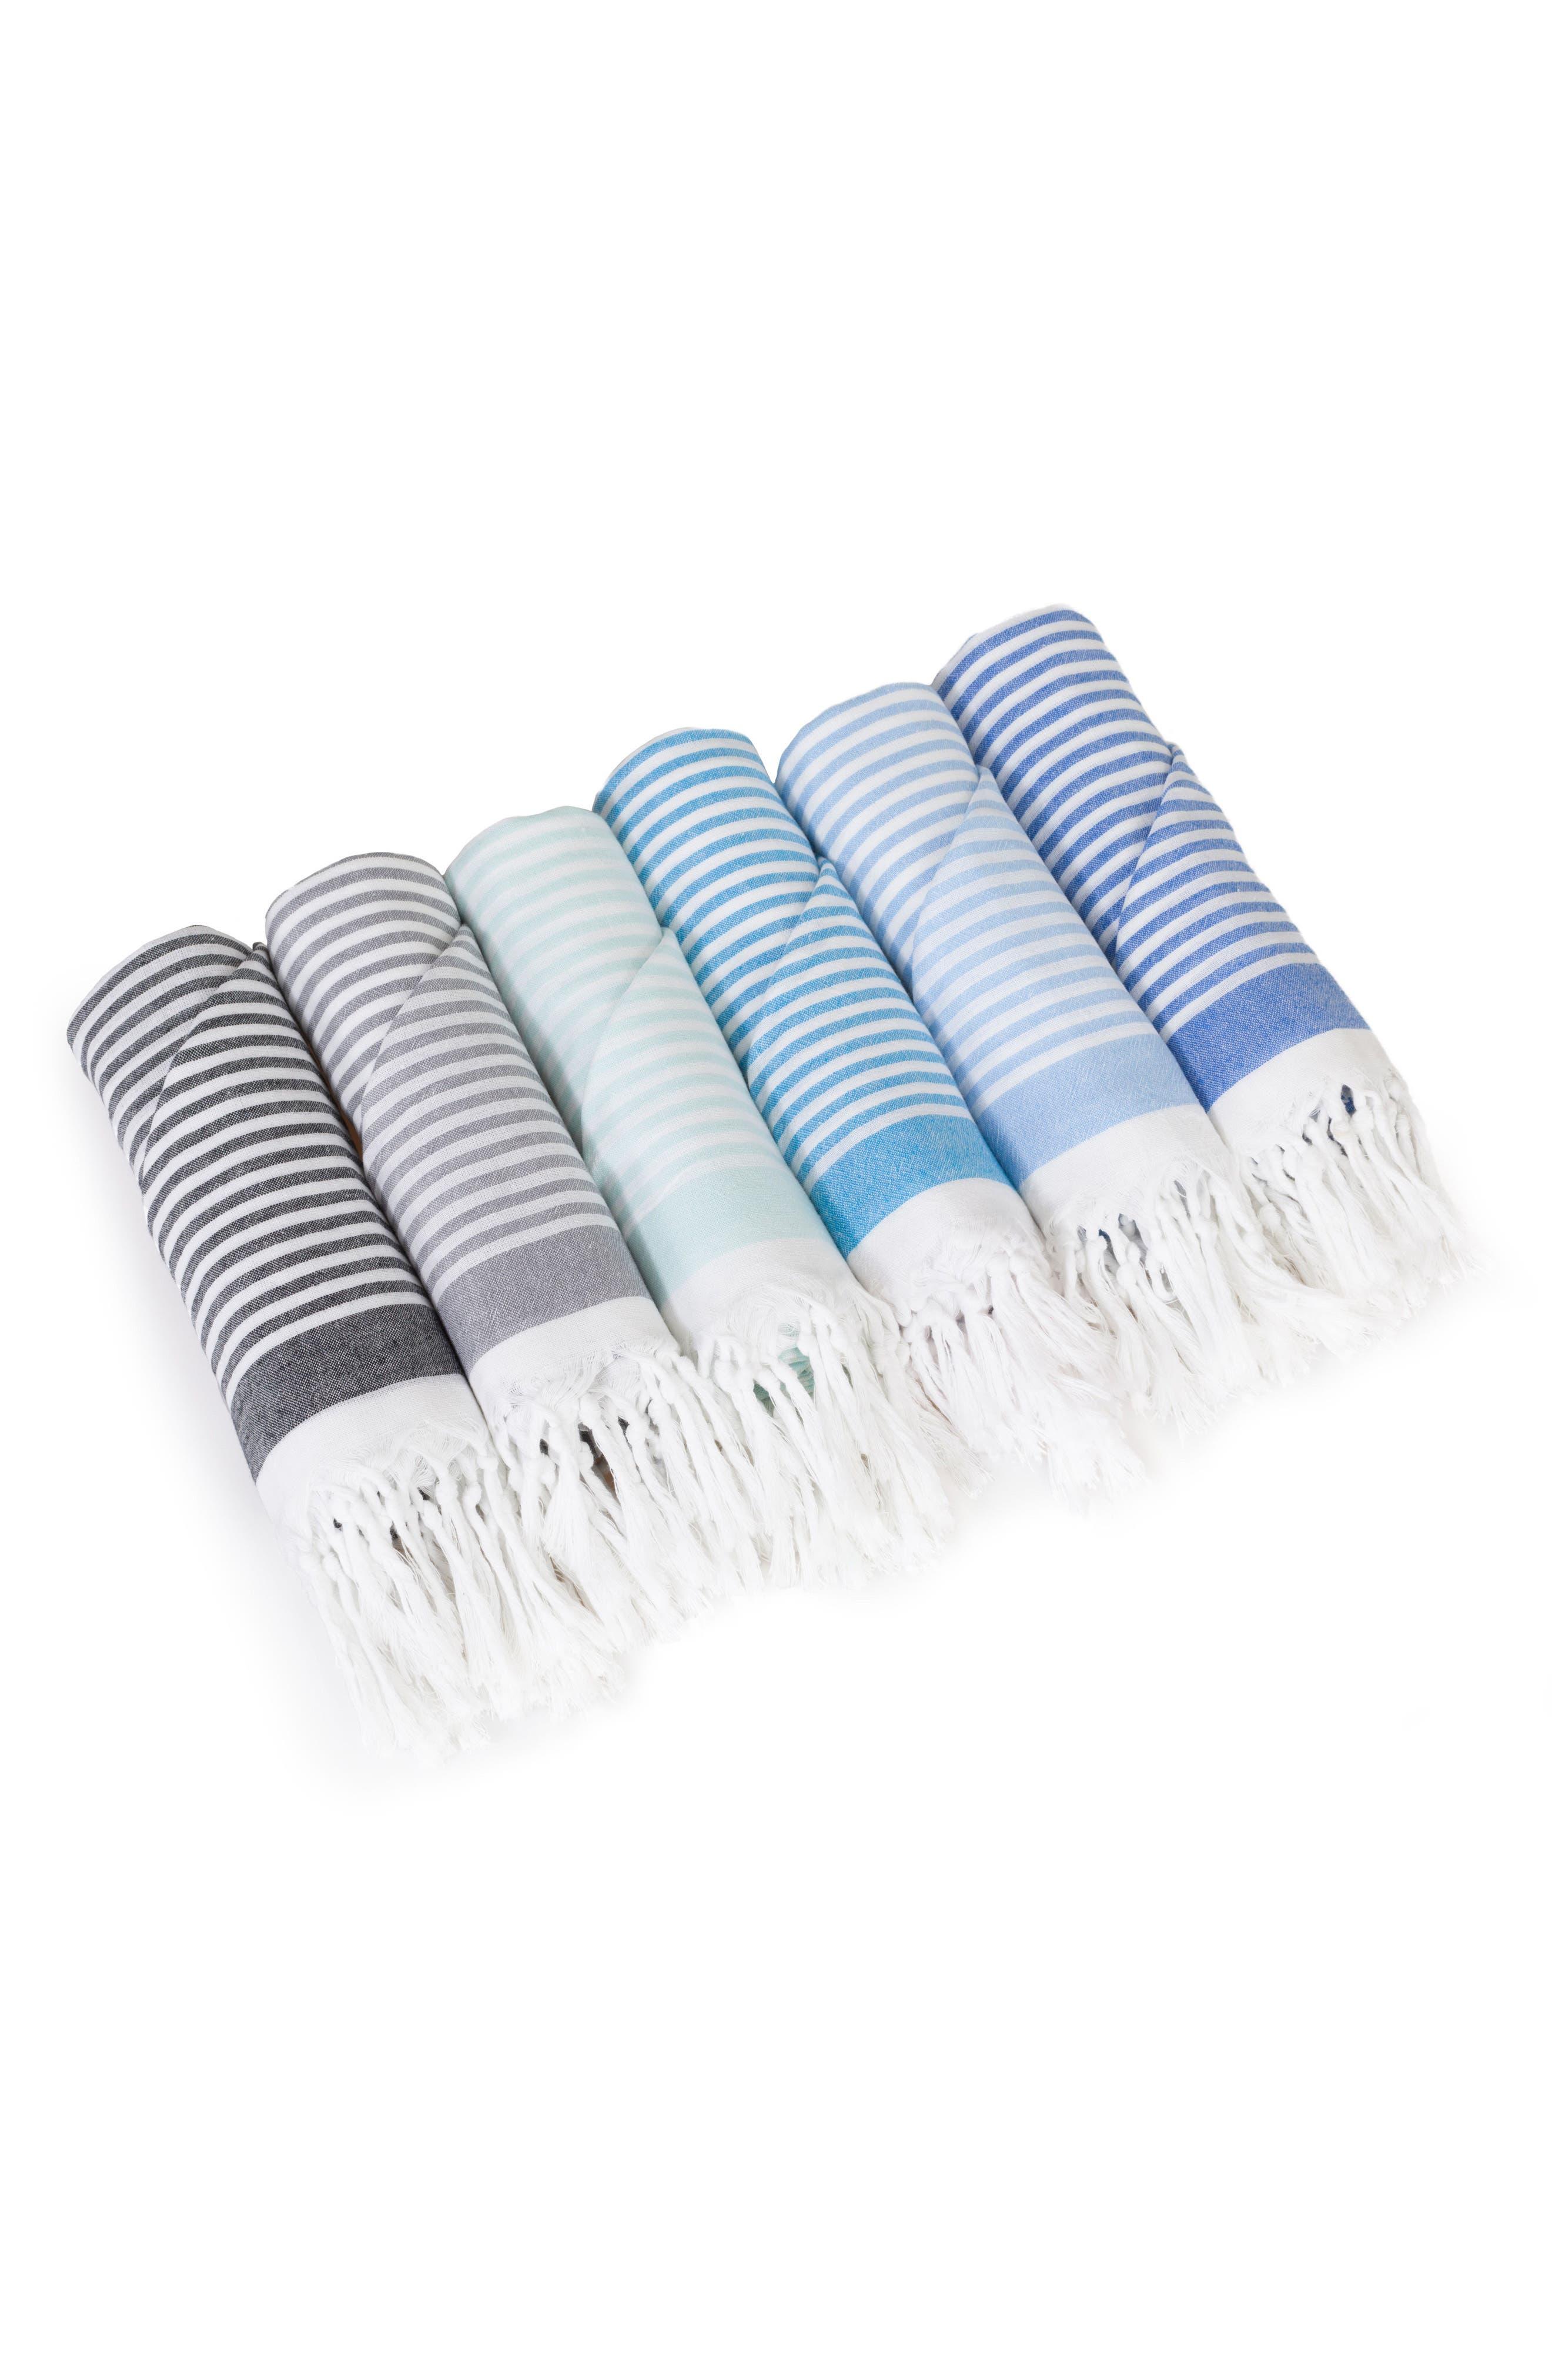 Soft Stripes Turkish Pestemal Towel,                             Alternate thumbnail 5, color,                             Sky Blue